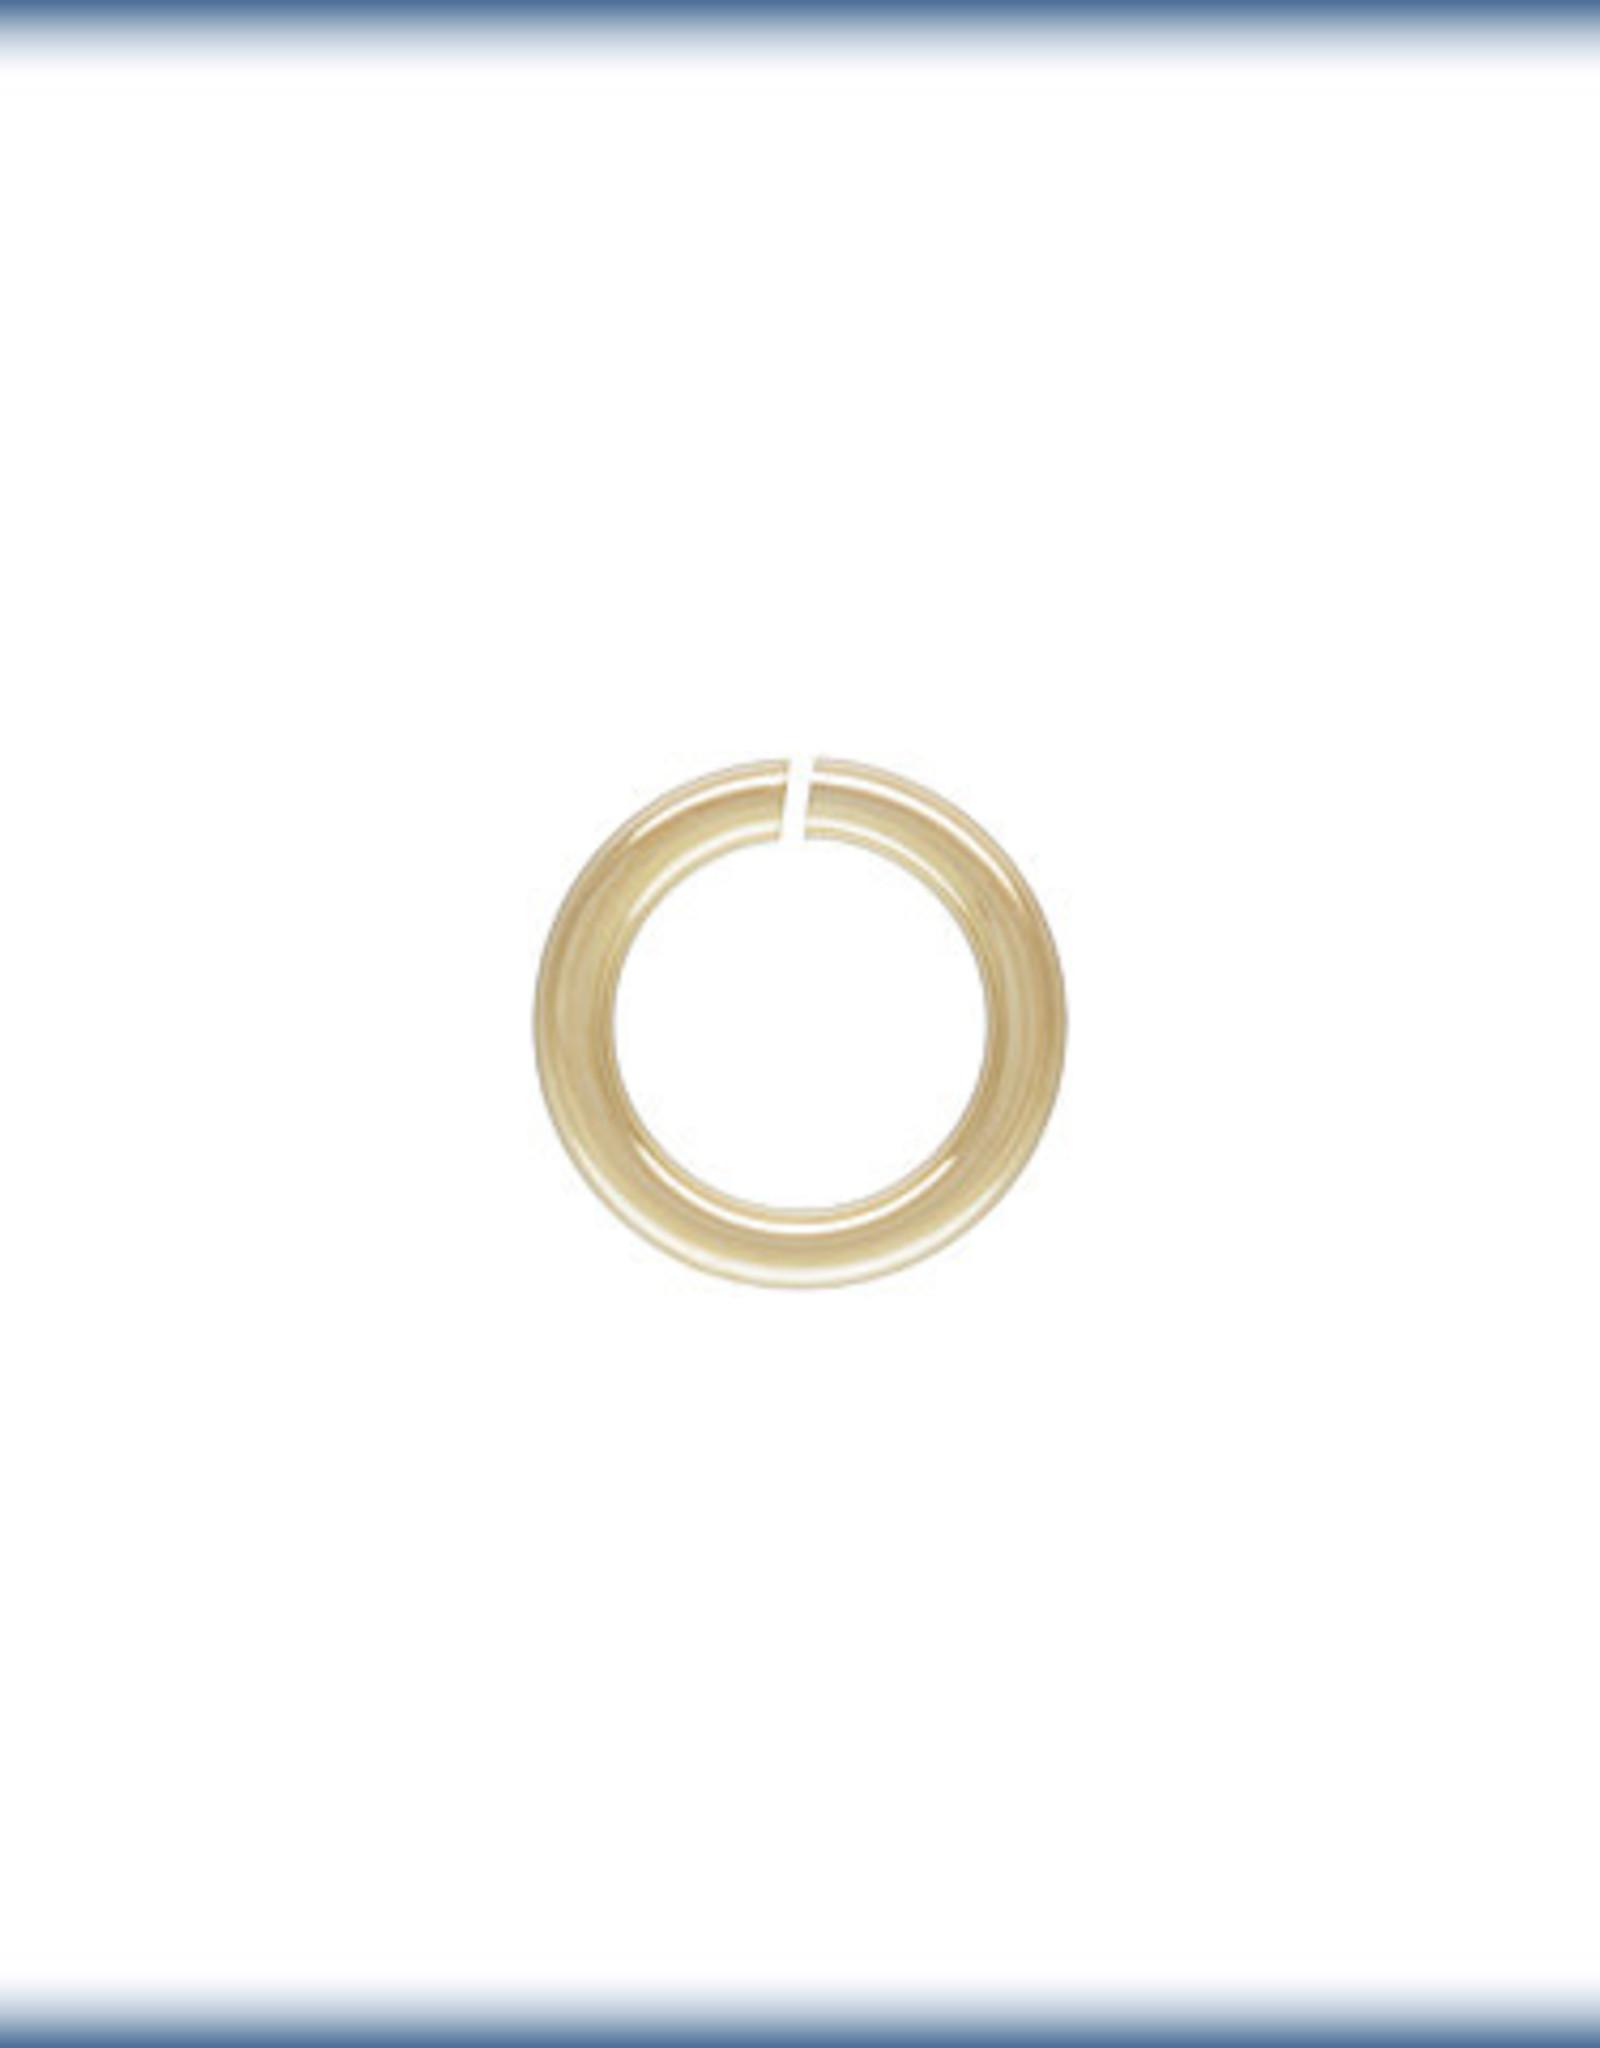 4mm Jump Rings 22ga, 14k Gold Filled Qty 10